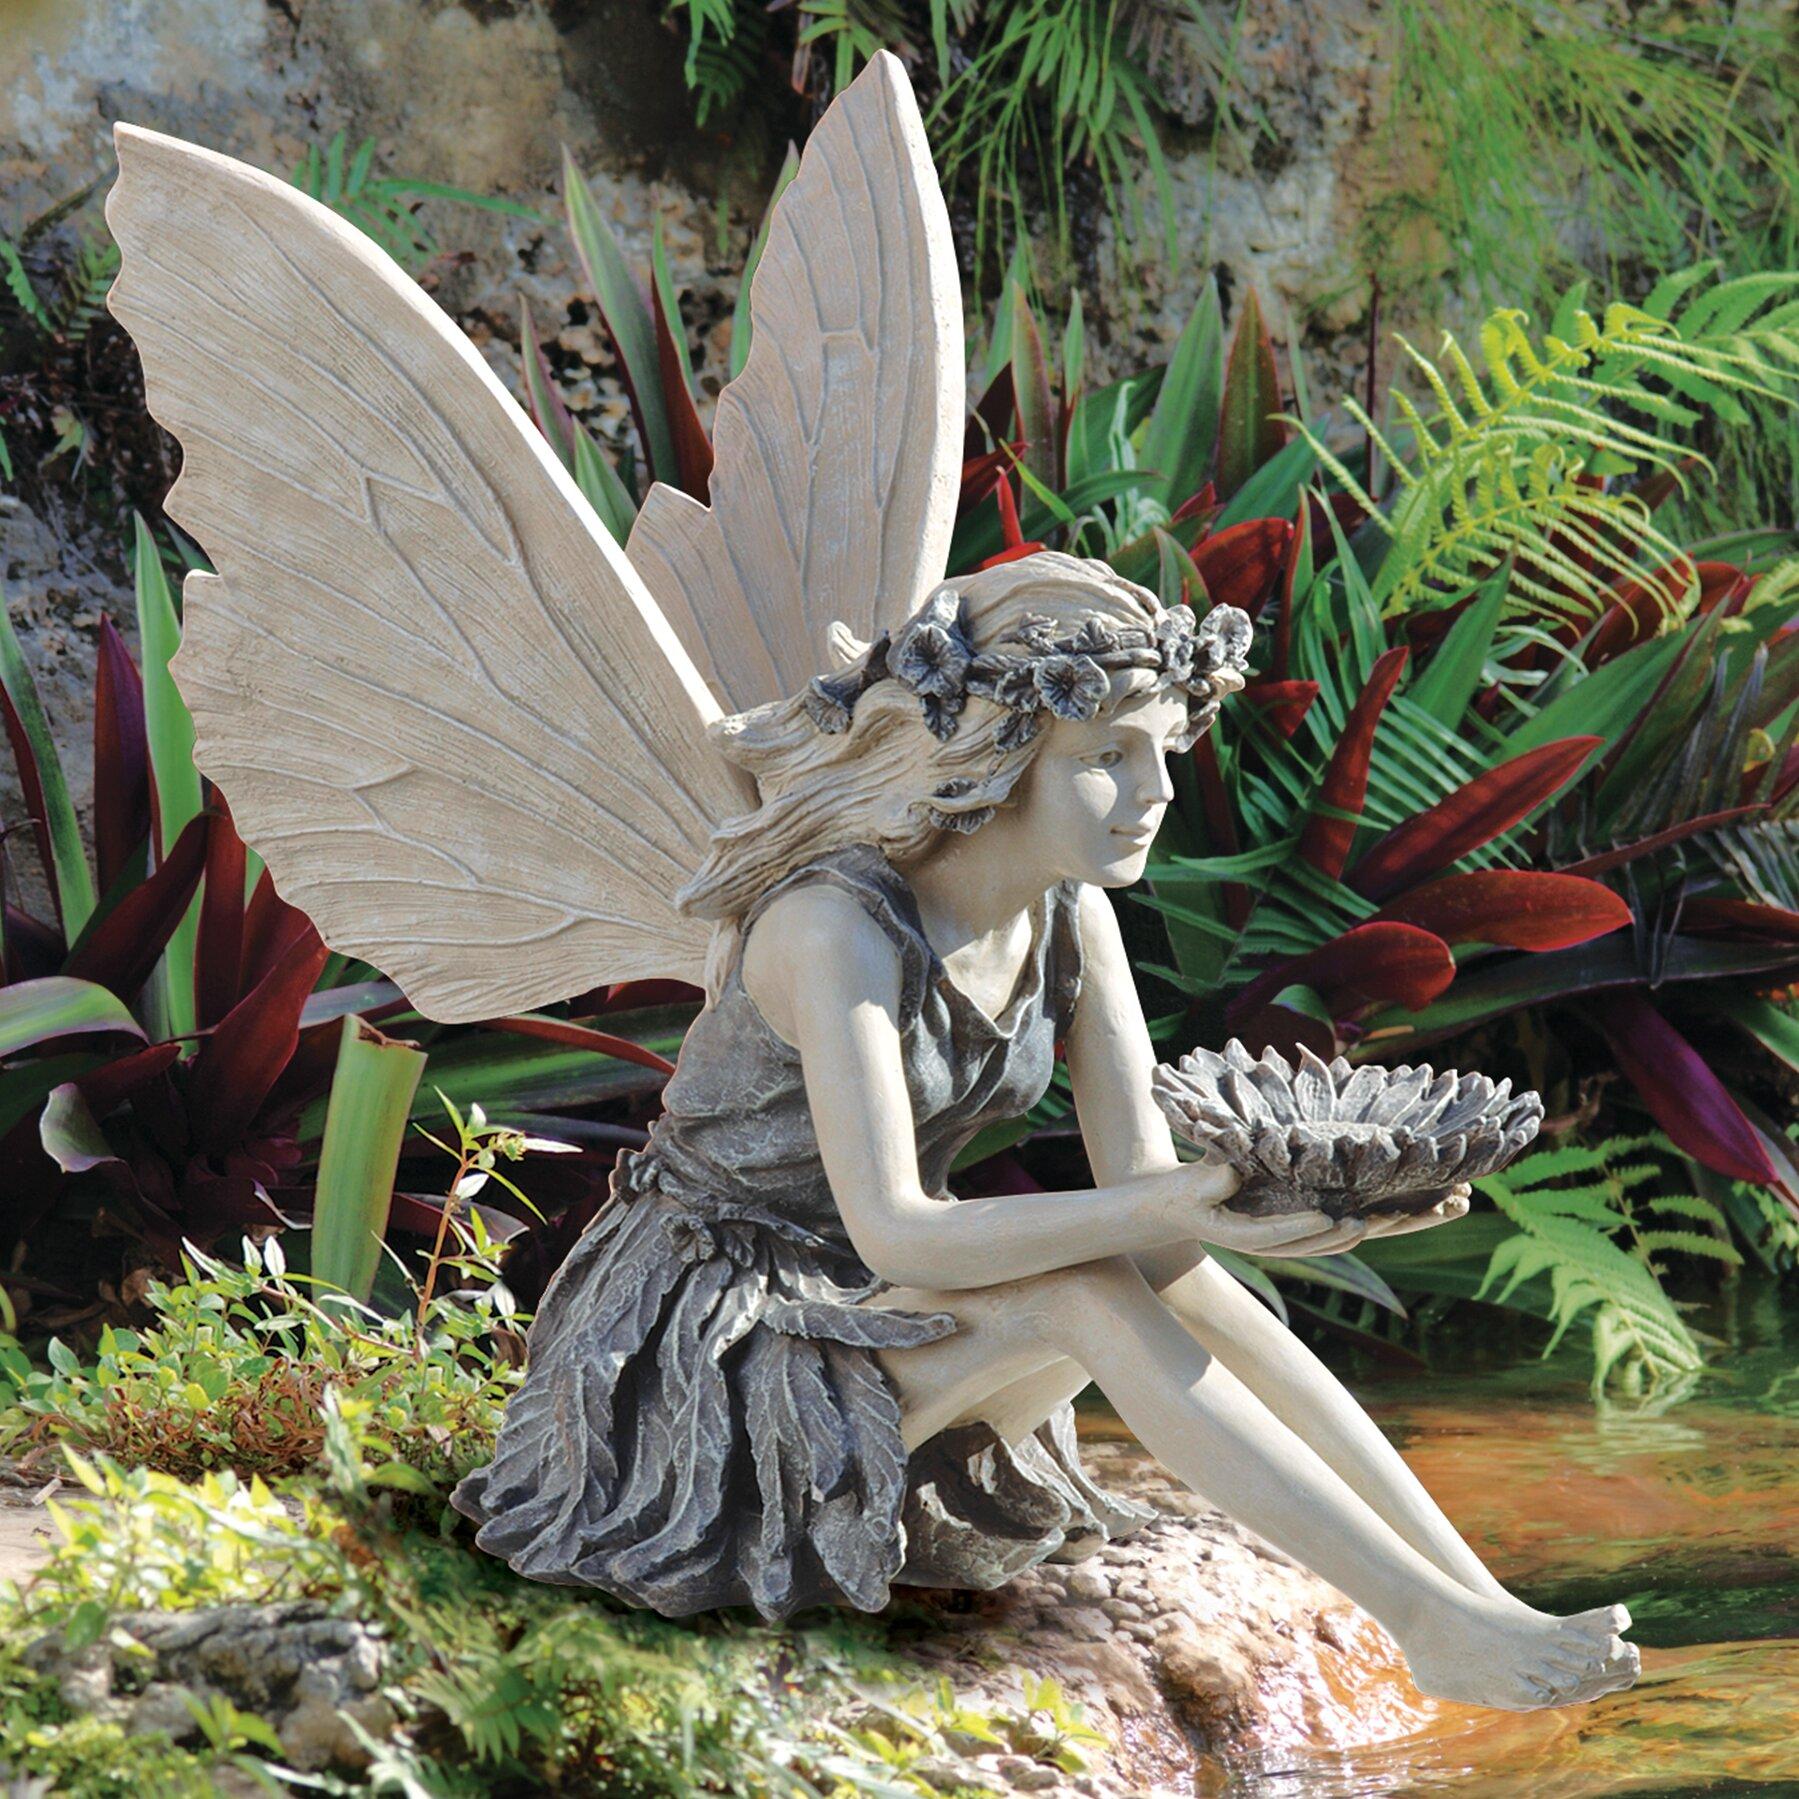 Fairy lawn ornaments - The Sunflower Fairy Statue